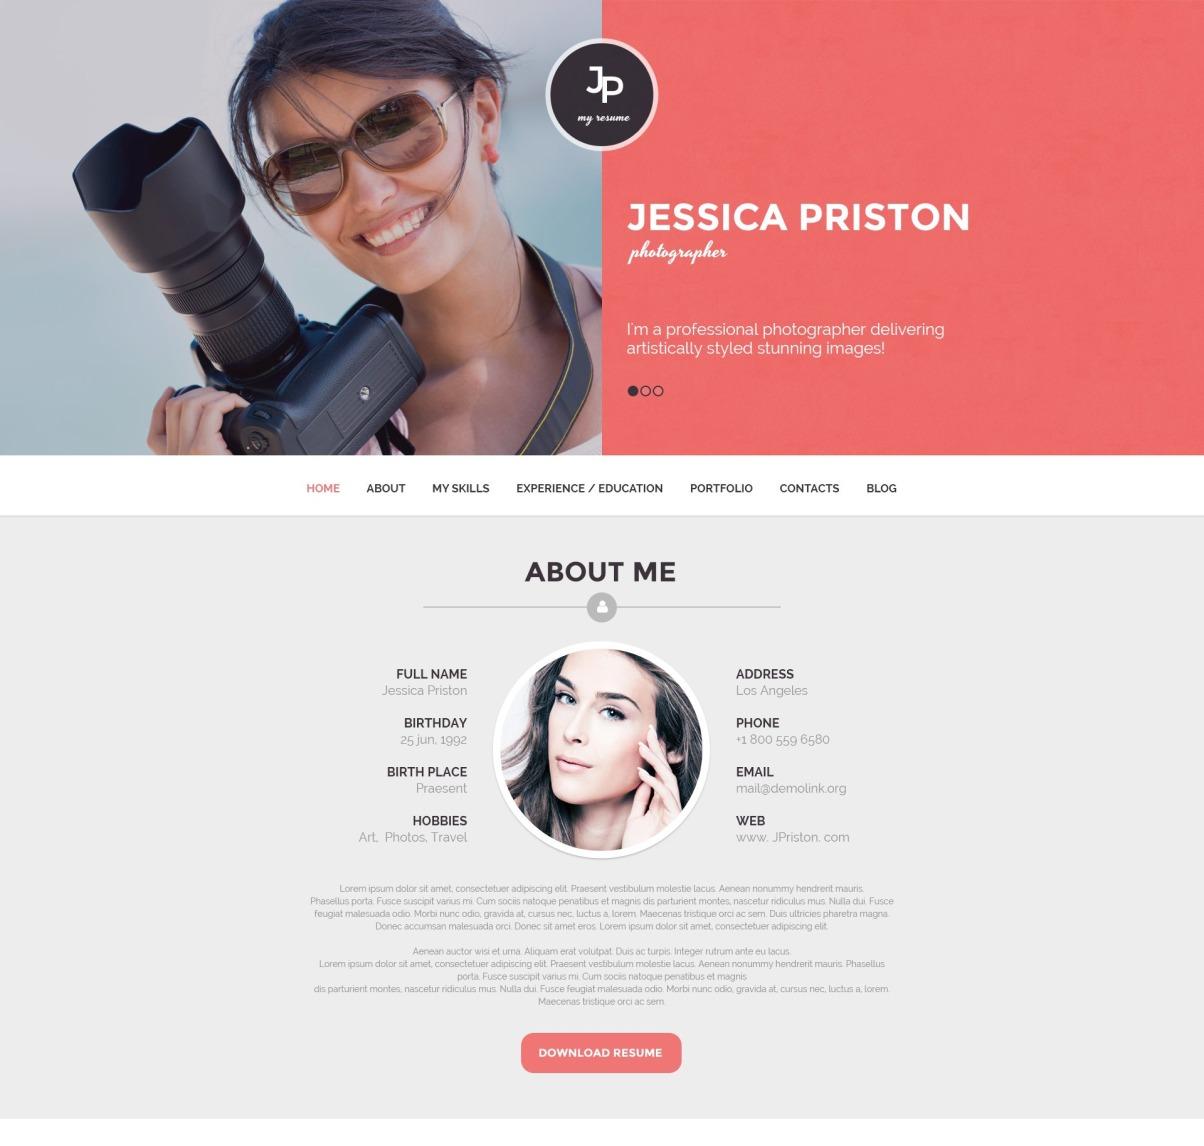 Resume WordPress Theme from s.tmimgcdn.com